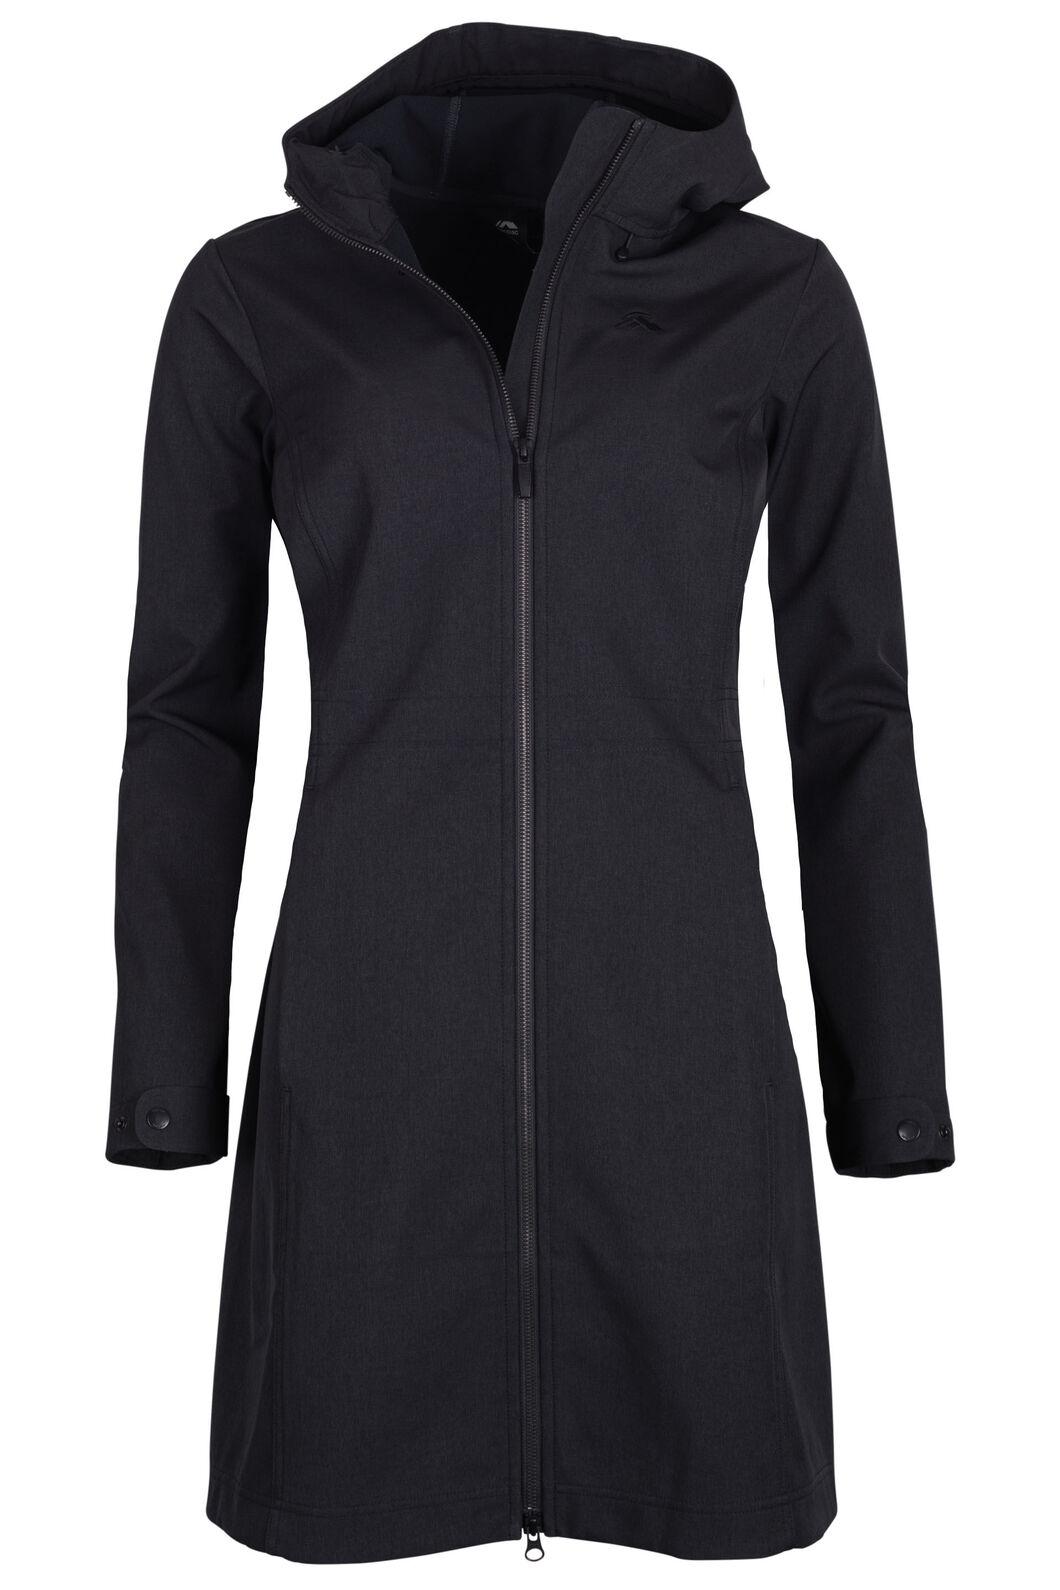 Macpac Chord Softshell Coat - Women's, Black, hi-res